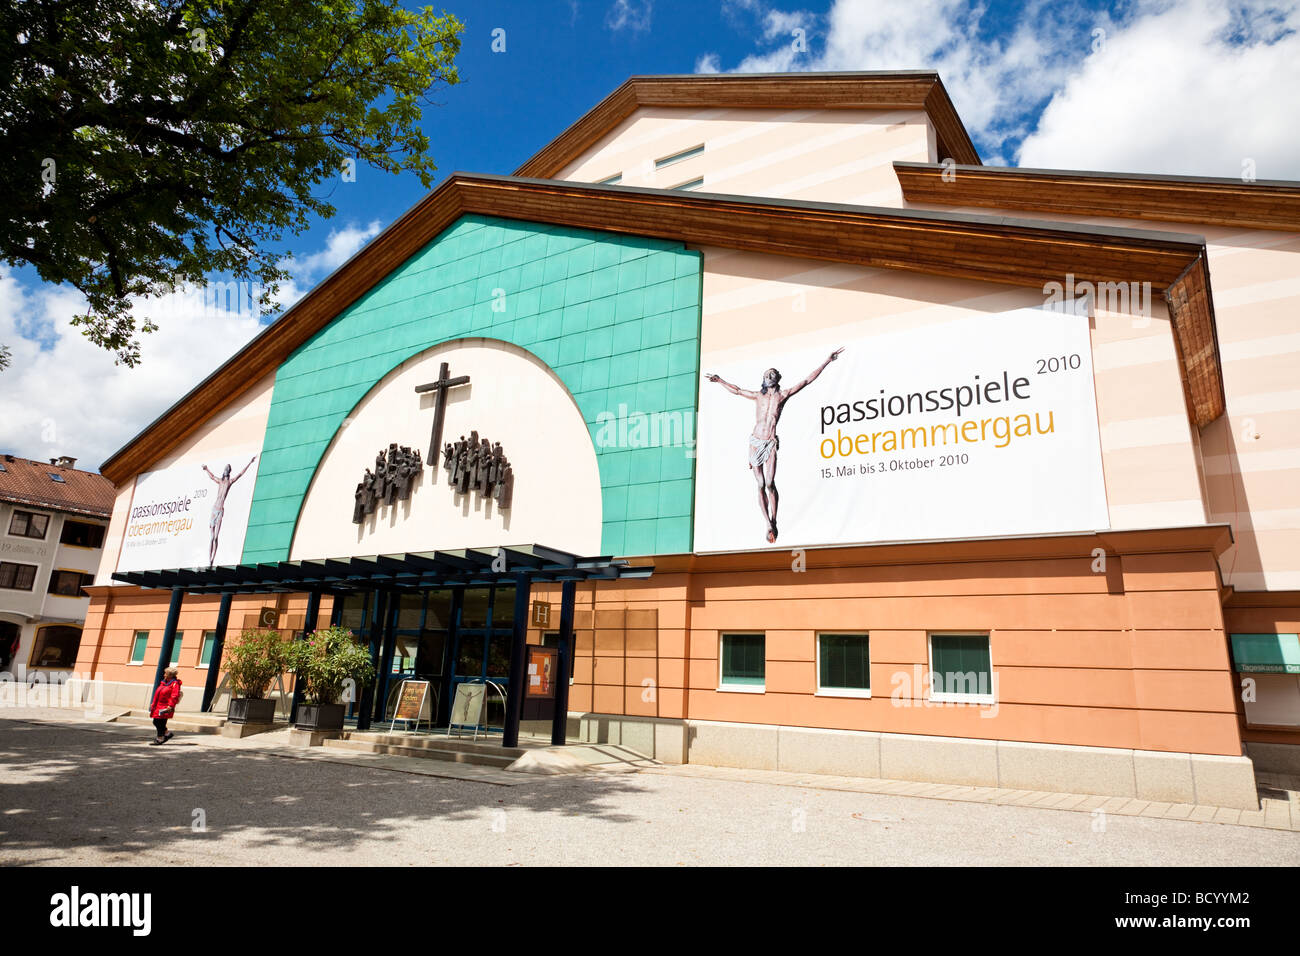 Oberammergau Passion Play Theatre, Bavaria Germany - Stock Image